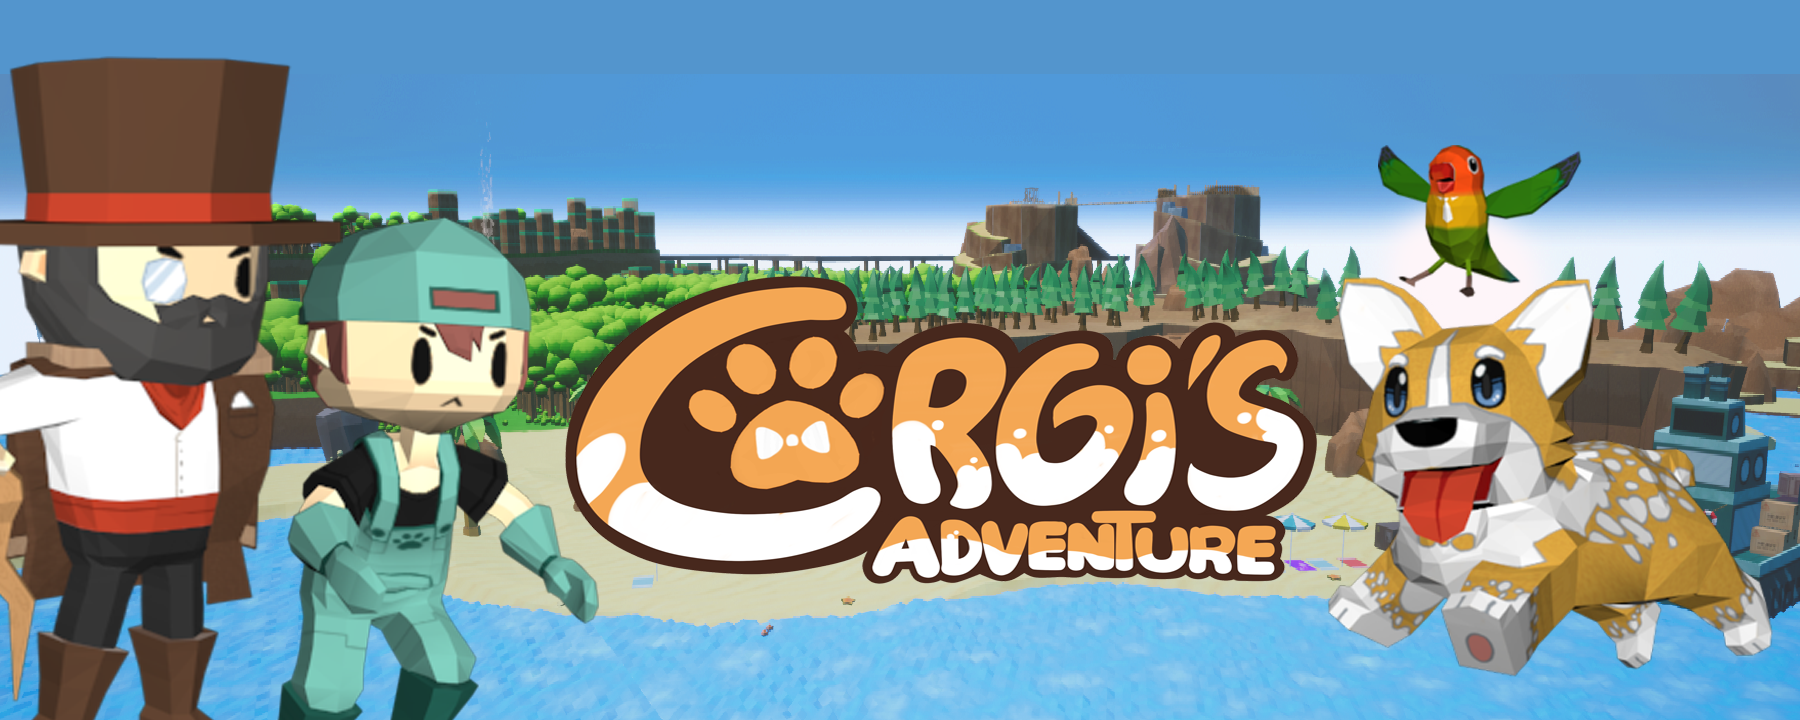 Corgi's adventure